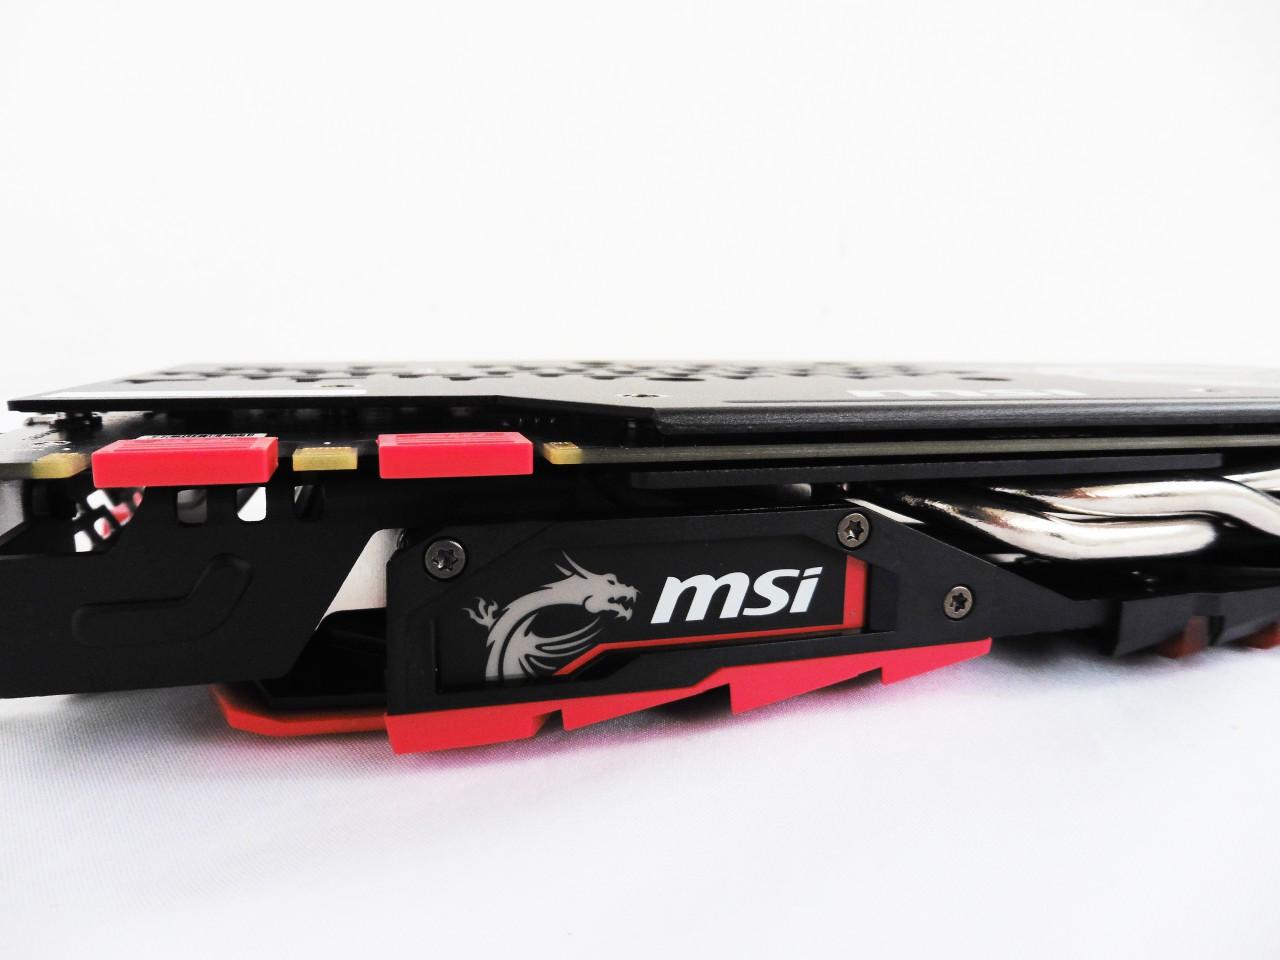 MSI GeForce GTX 1080 Gaming X 8G Review 6